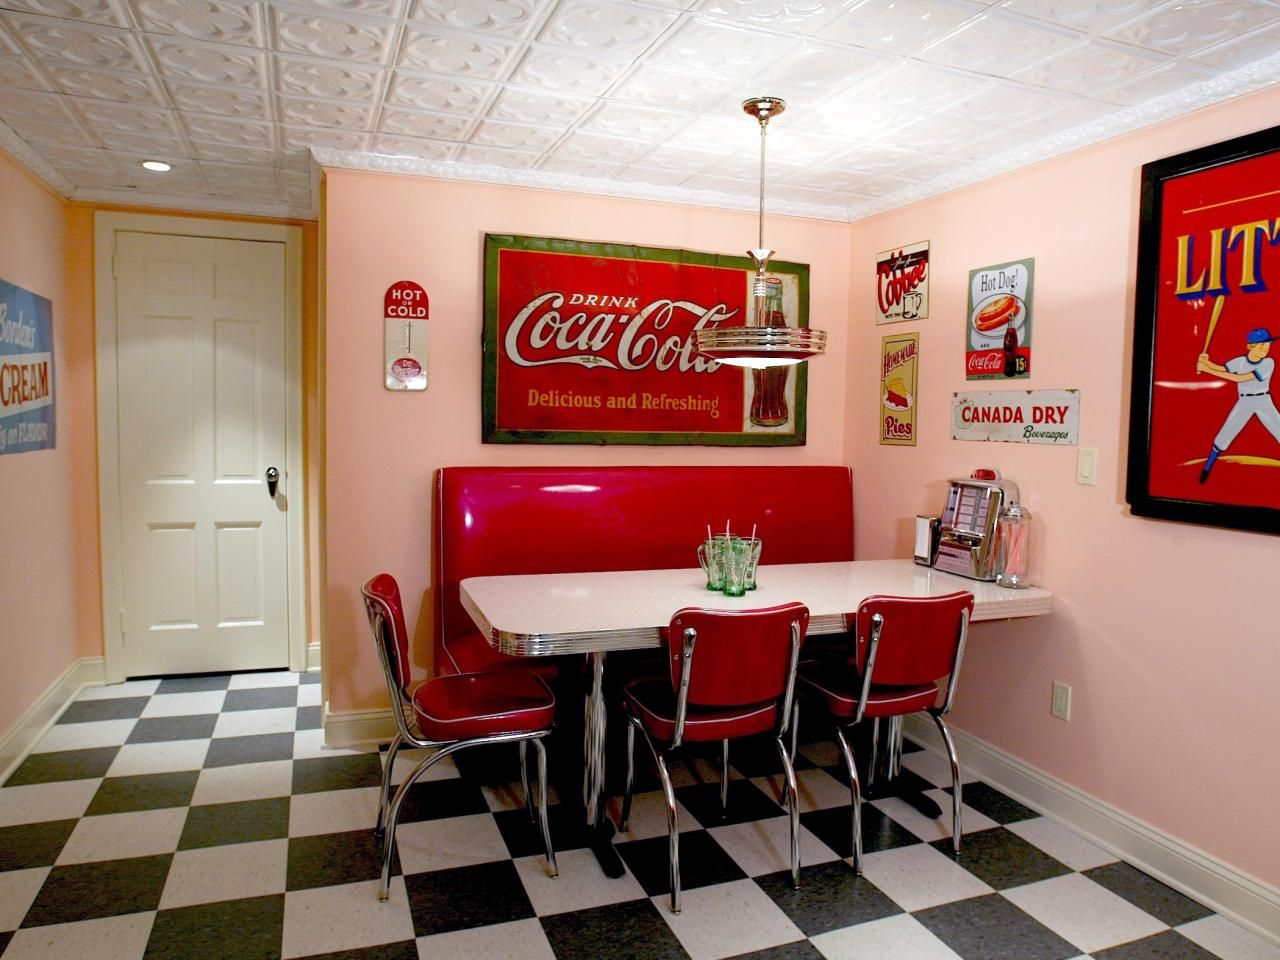 Atemberaubend 50 S Diner Küche Ideen Ideen - Küchenschrank Ideen ...